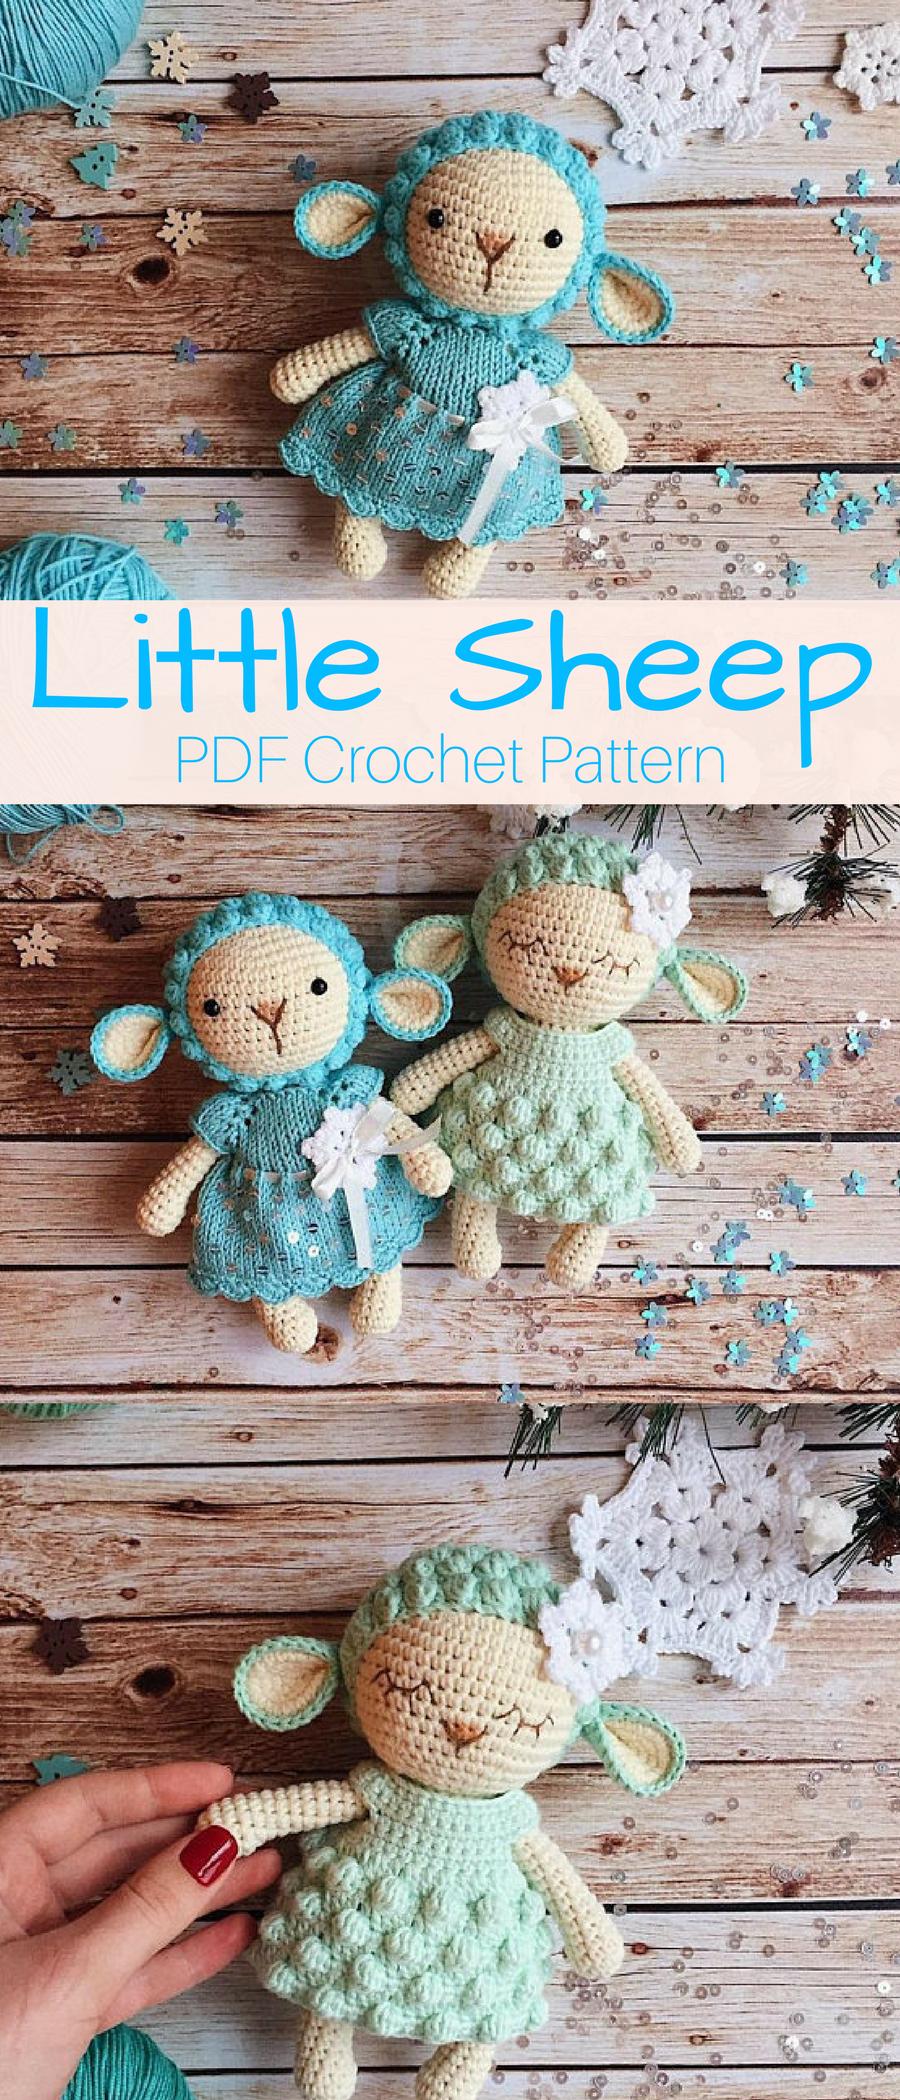 156 Crochet Pattern - Mulya the Sheep - Amigurumi soft toy PDF ... | 2100x900